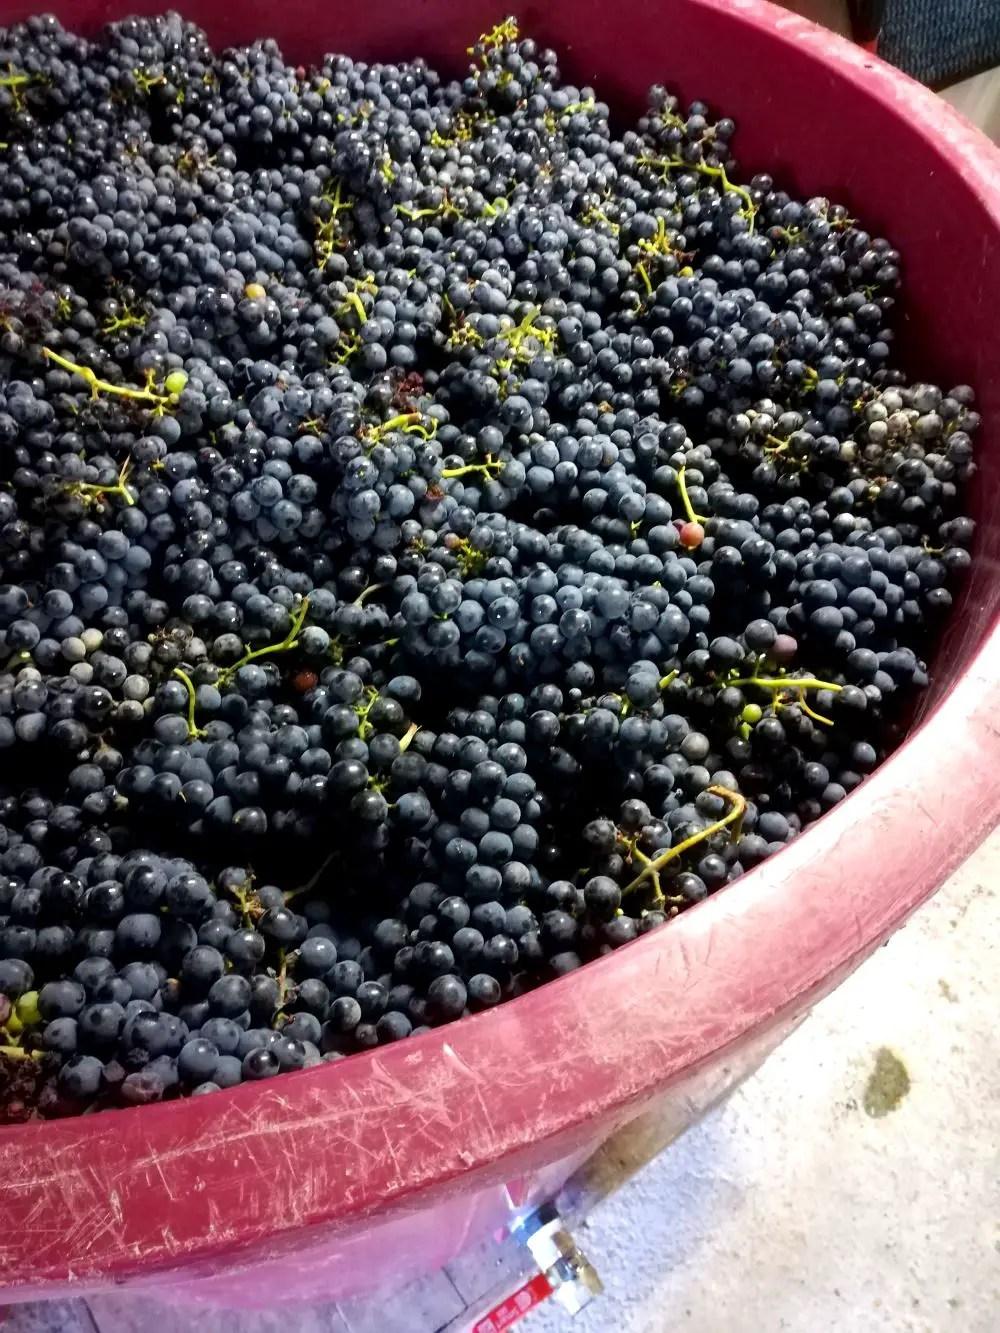 Vessel full of grapes